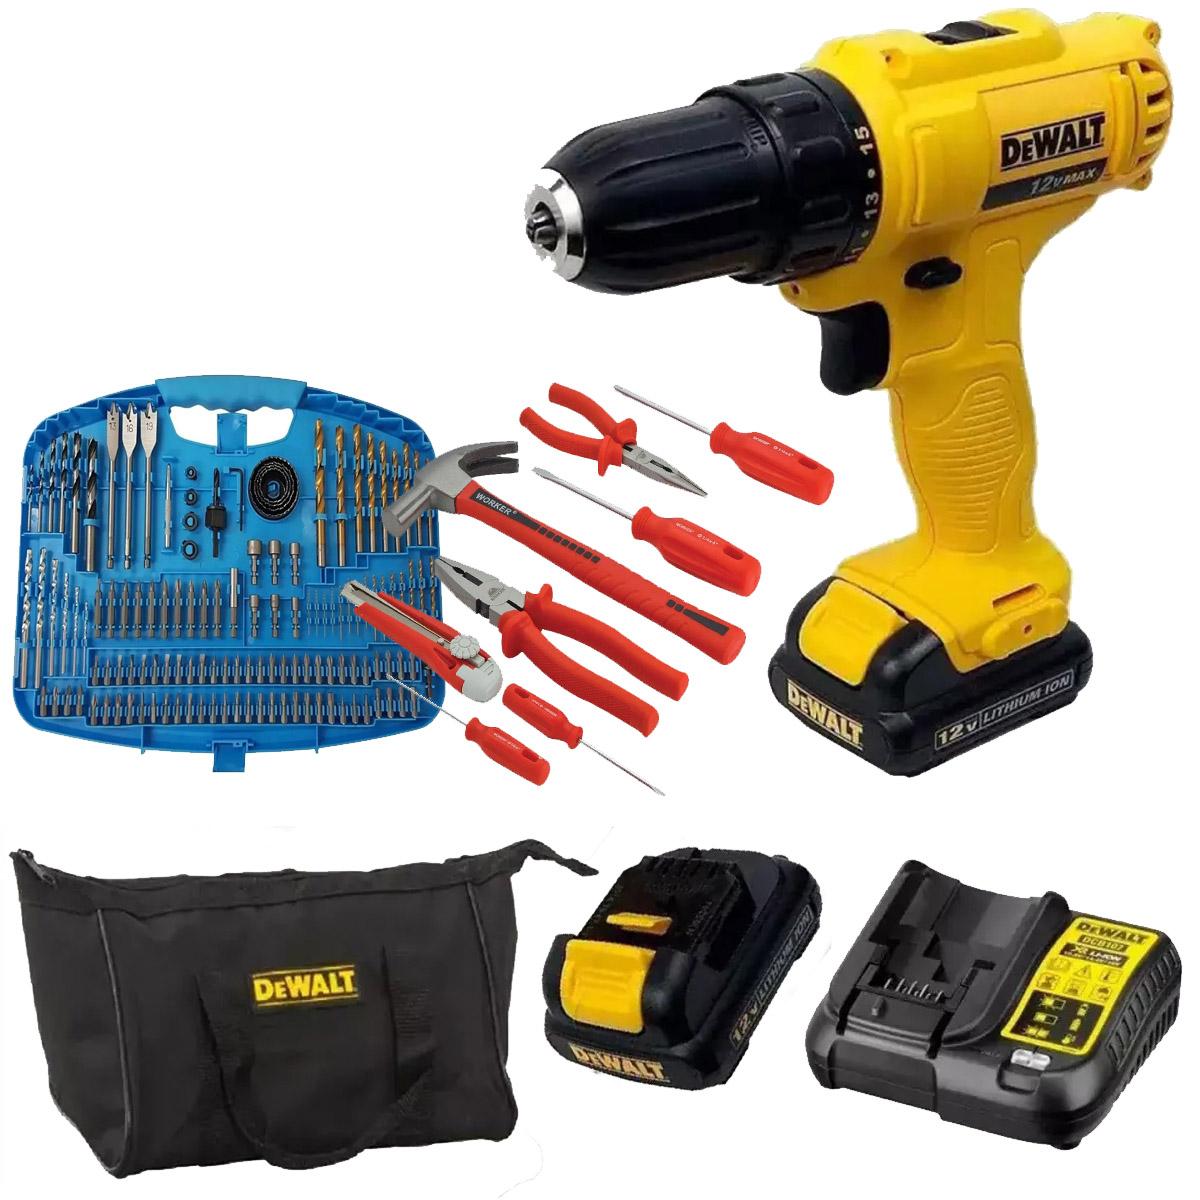 Parafusadeira 2 Baterias + Kit Ferramentas + Kit Brocas Gamma